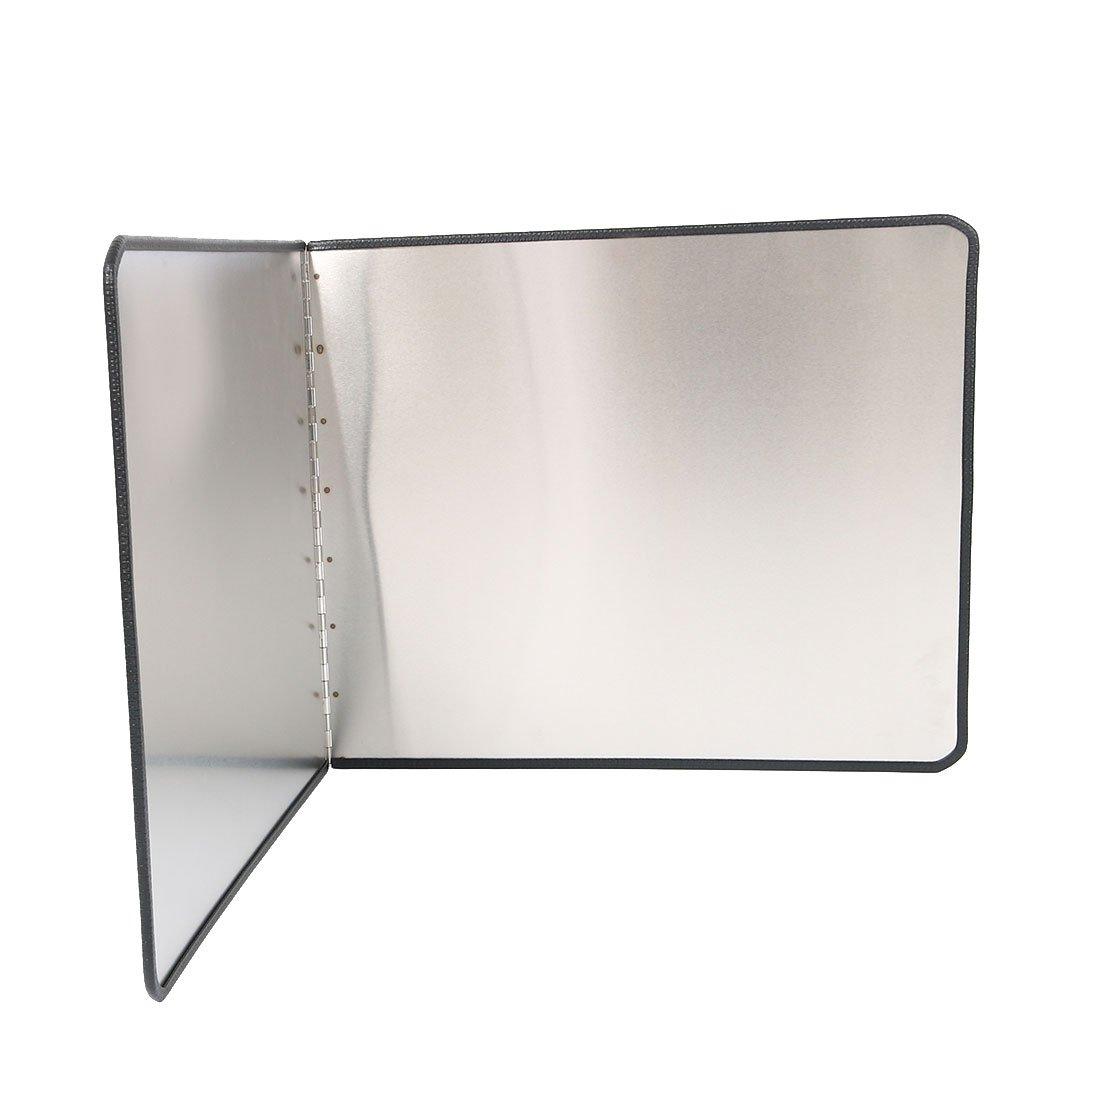 "uxcell Oil Splash Guard, Stainless Steel Foldable Splatter Block for Frying Pan, Stove Shield, Kitchen Range Hood Wall Shield, 17.7"" x 15""(H) /45 x 38cm(H)"